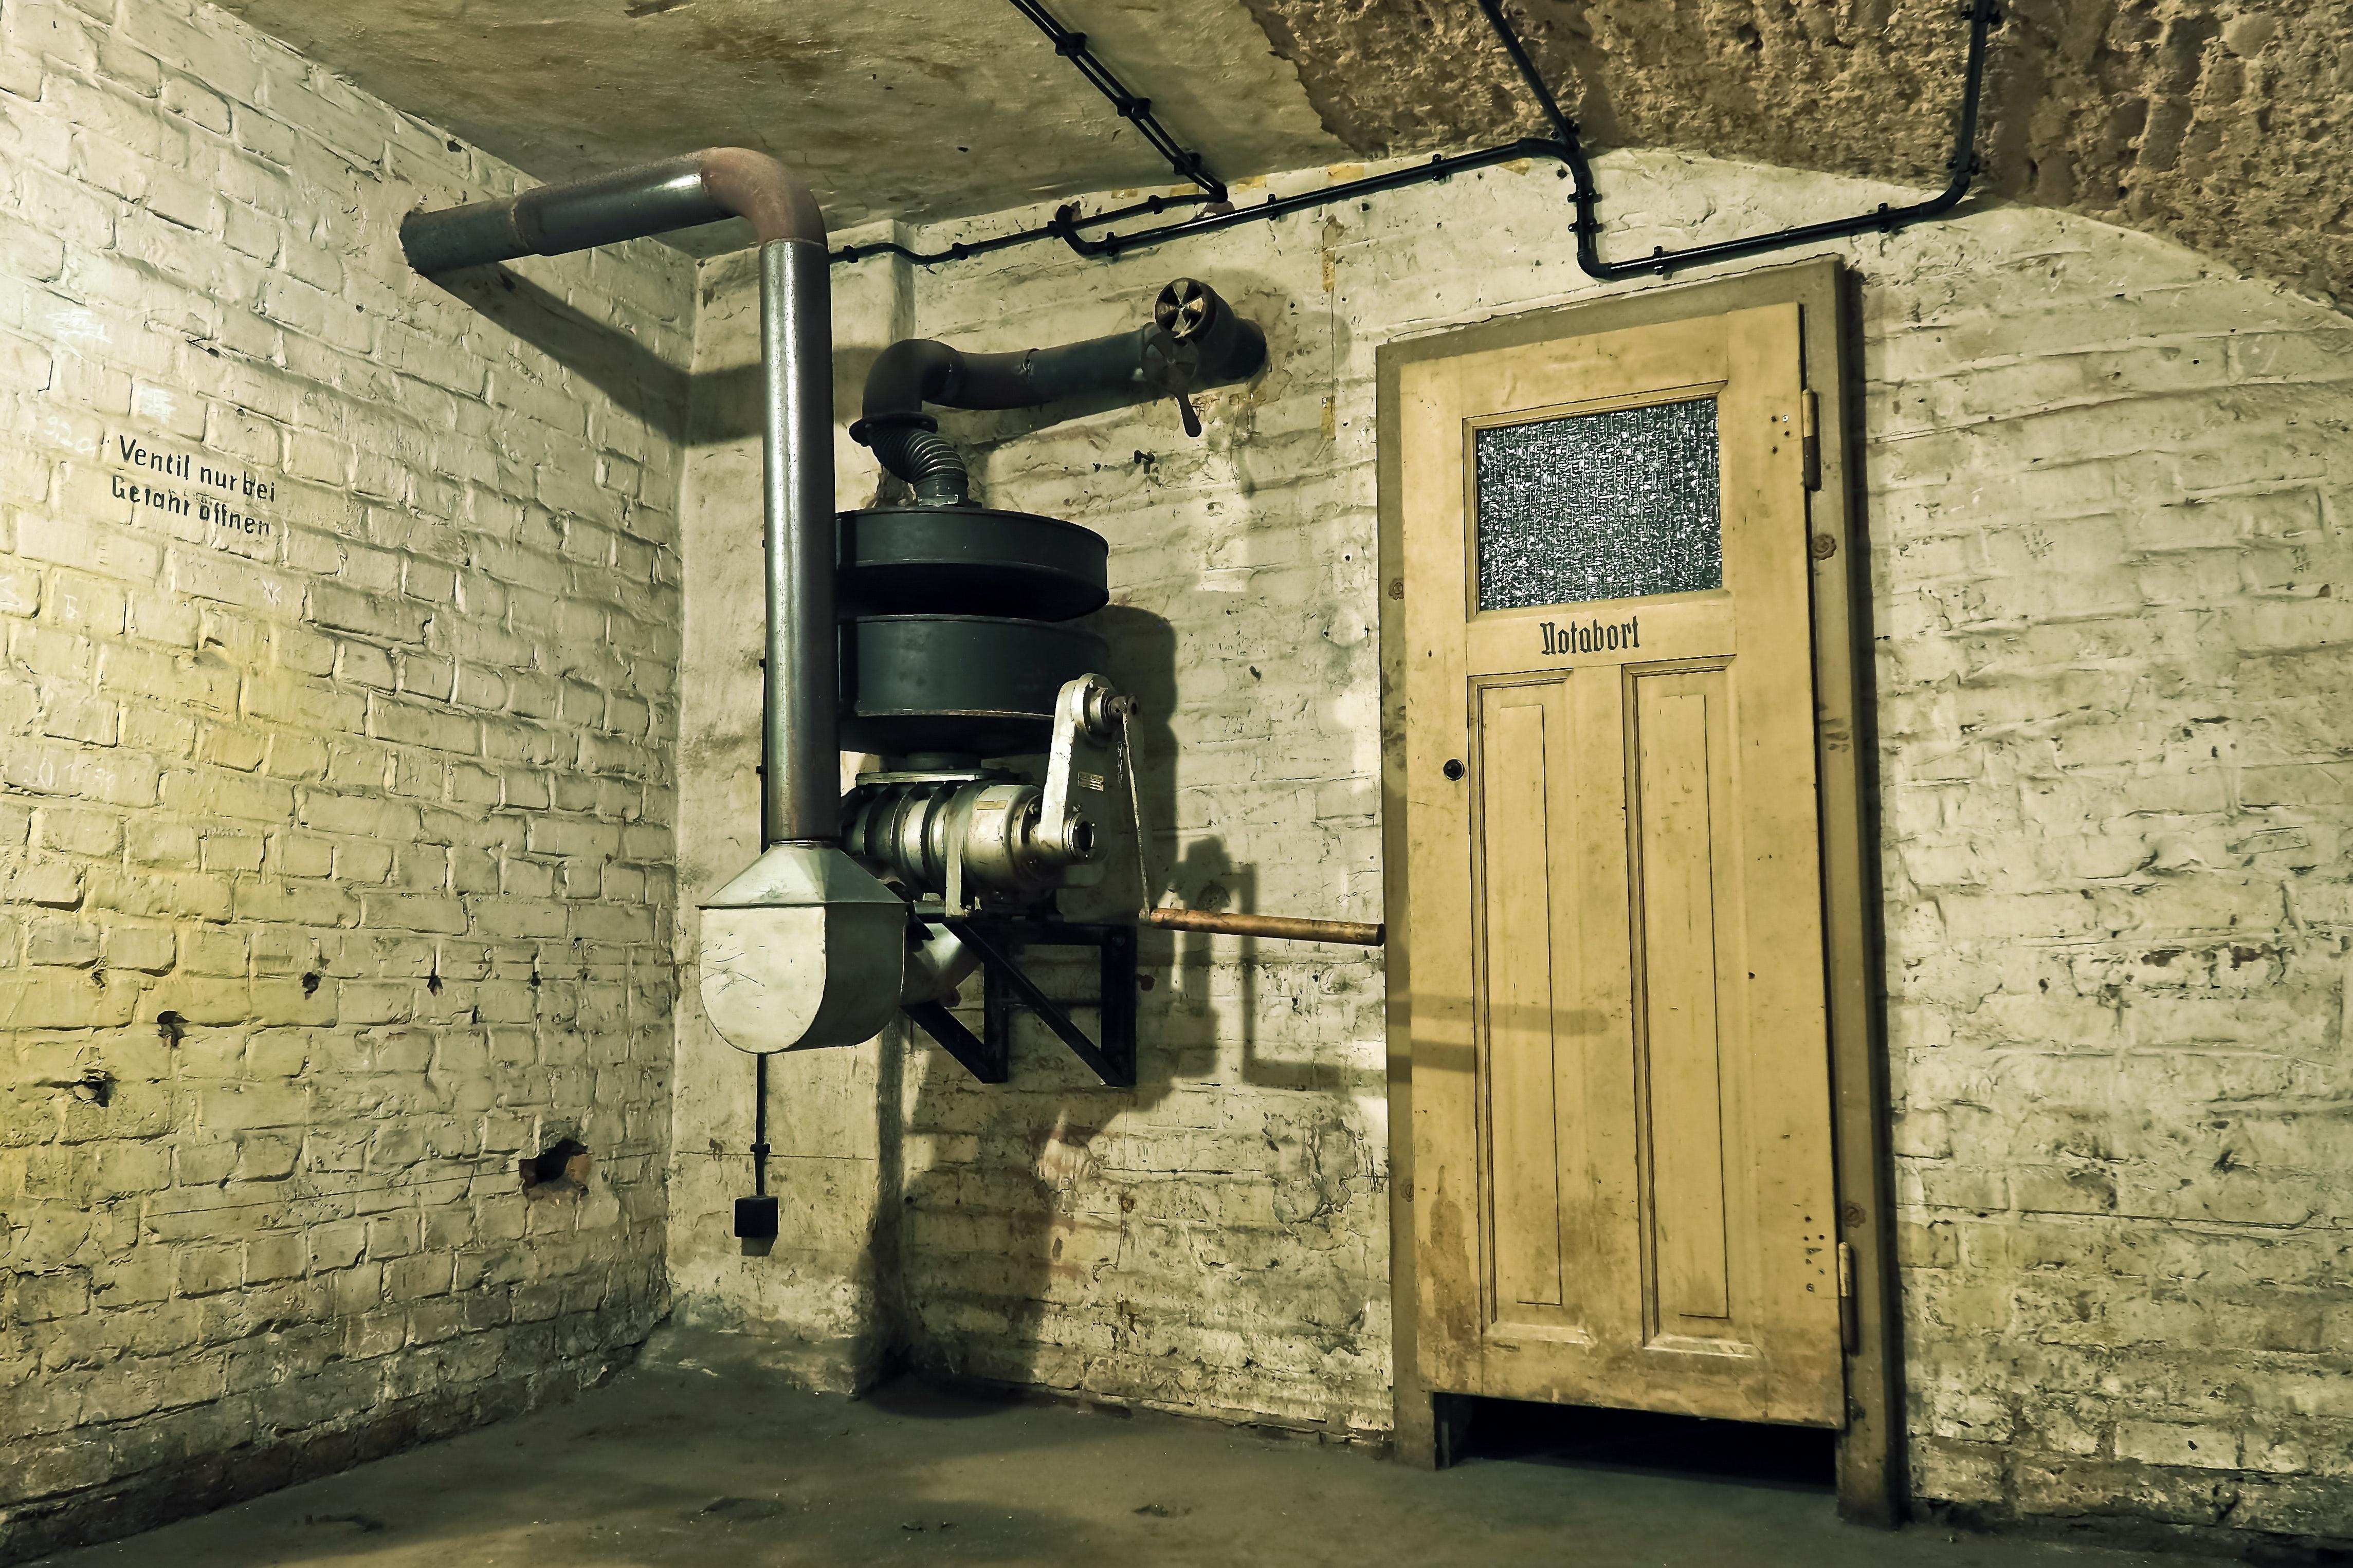 Black and gray metal machine inside a room photo